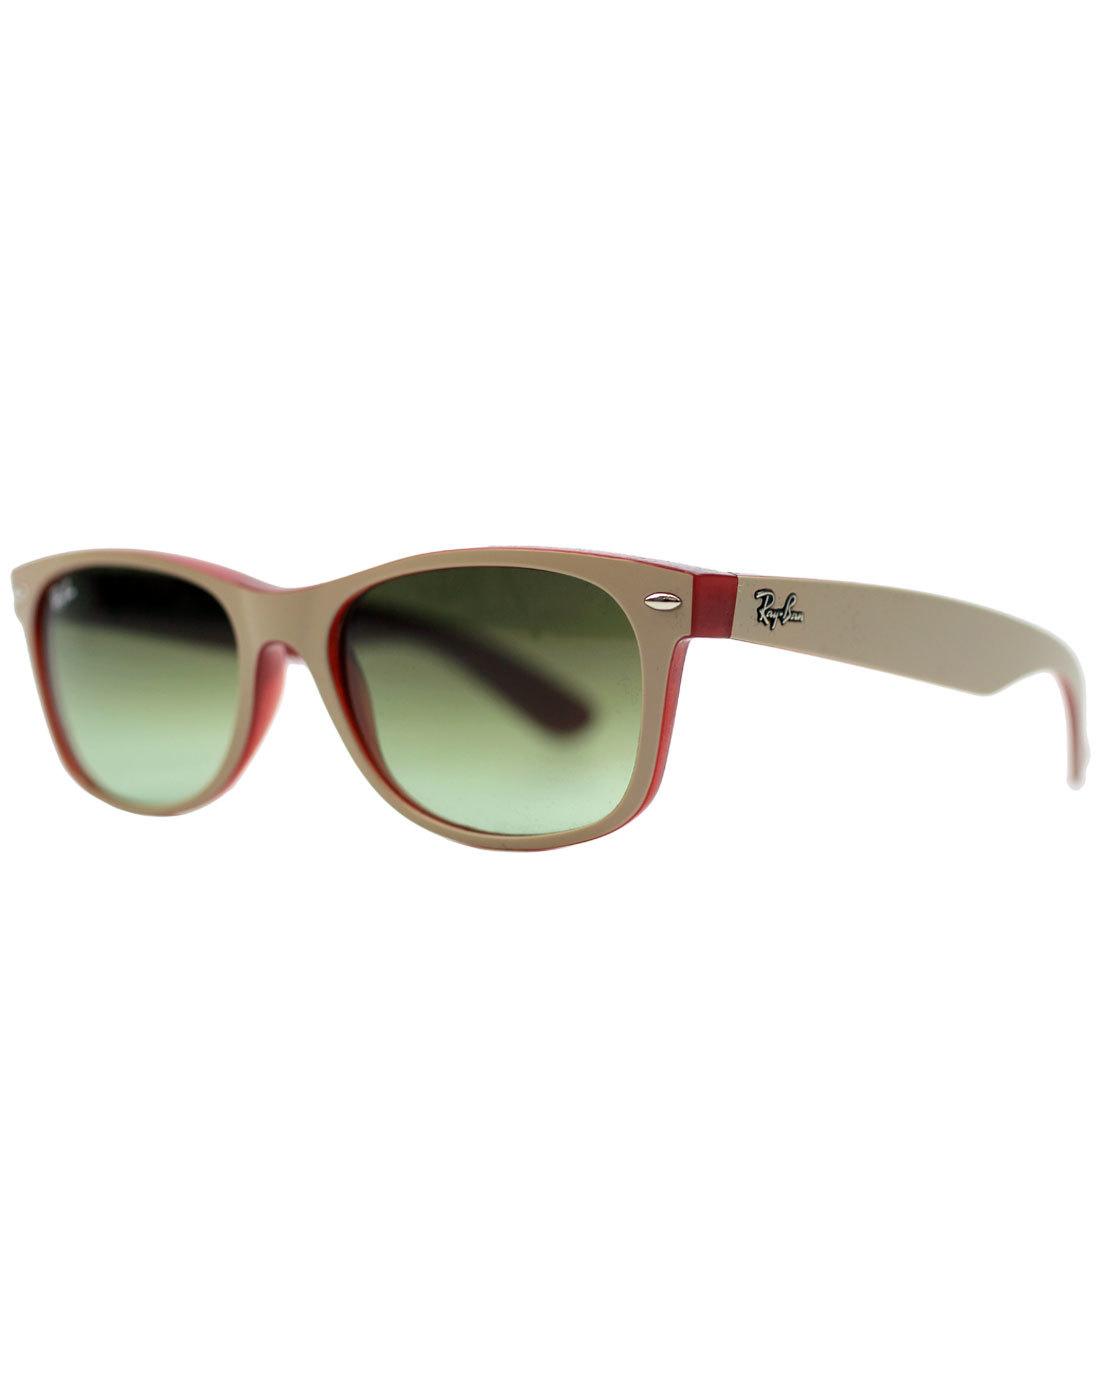 New Wayfarer RAY-BAN Retro Sunglasses - Beige/Red